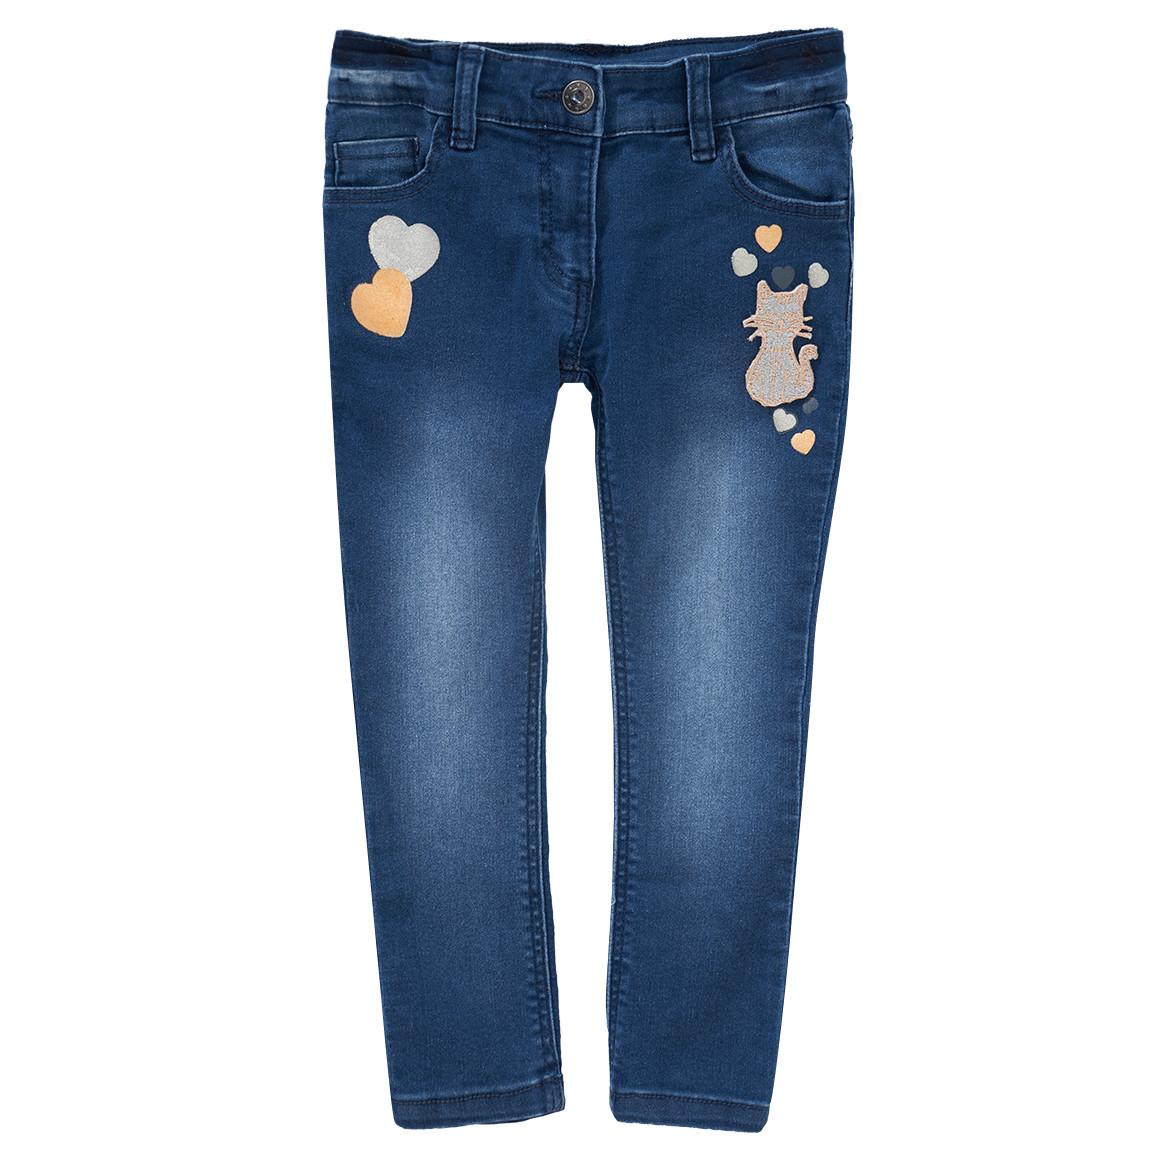 Minigirlhosen - Mädchen Skinny Jeans mit Katzen Applikation - Onlineshop Ernstings family